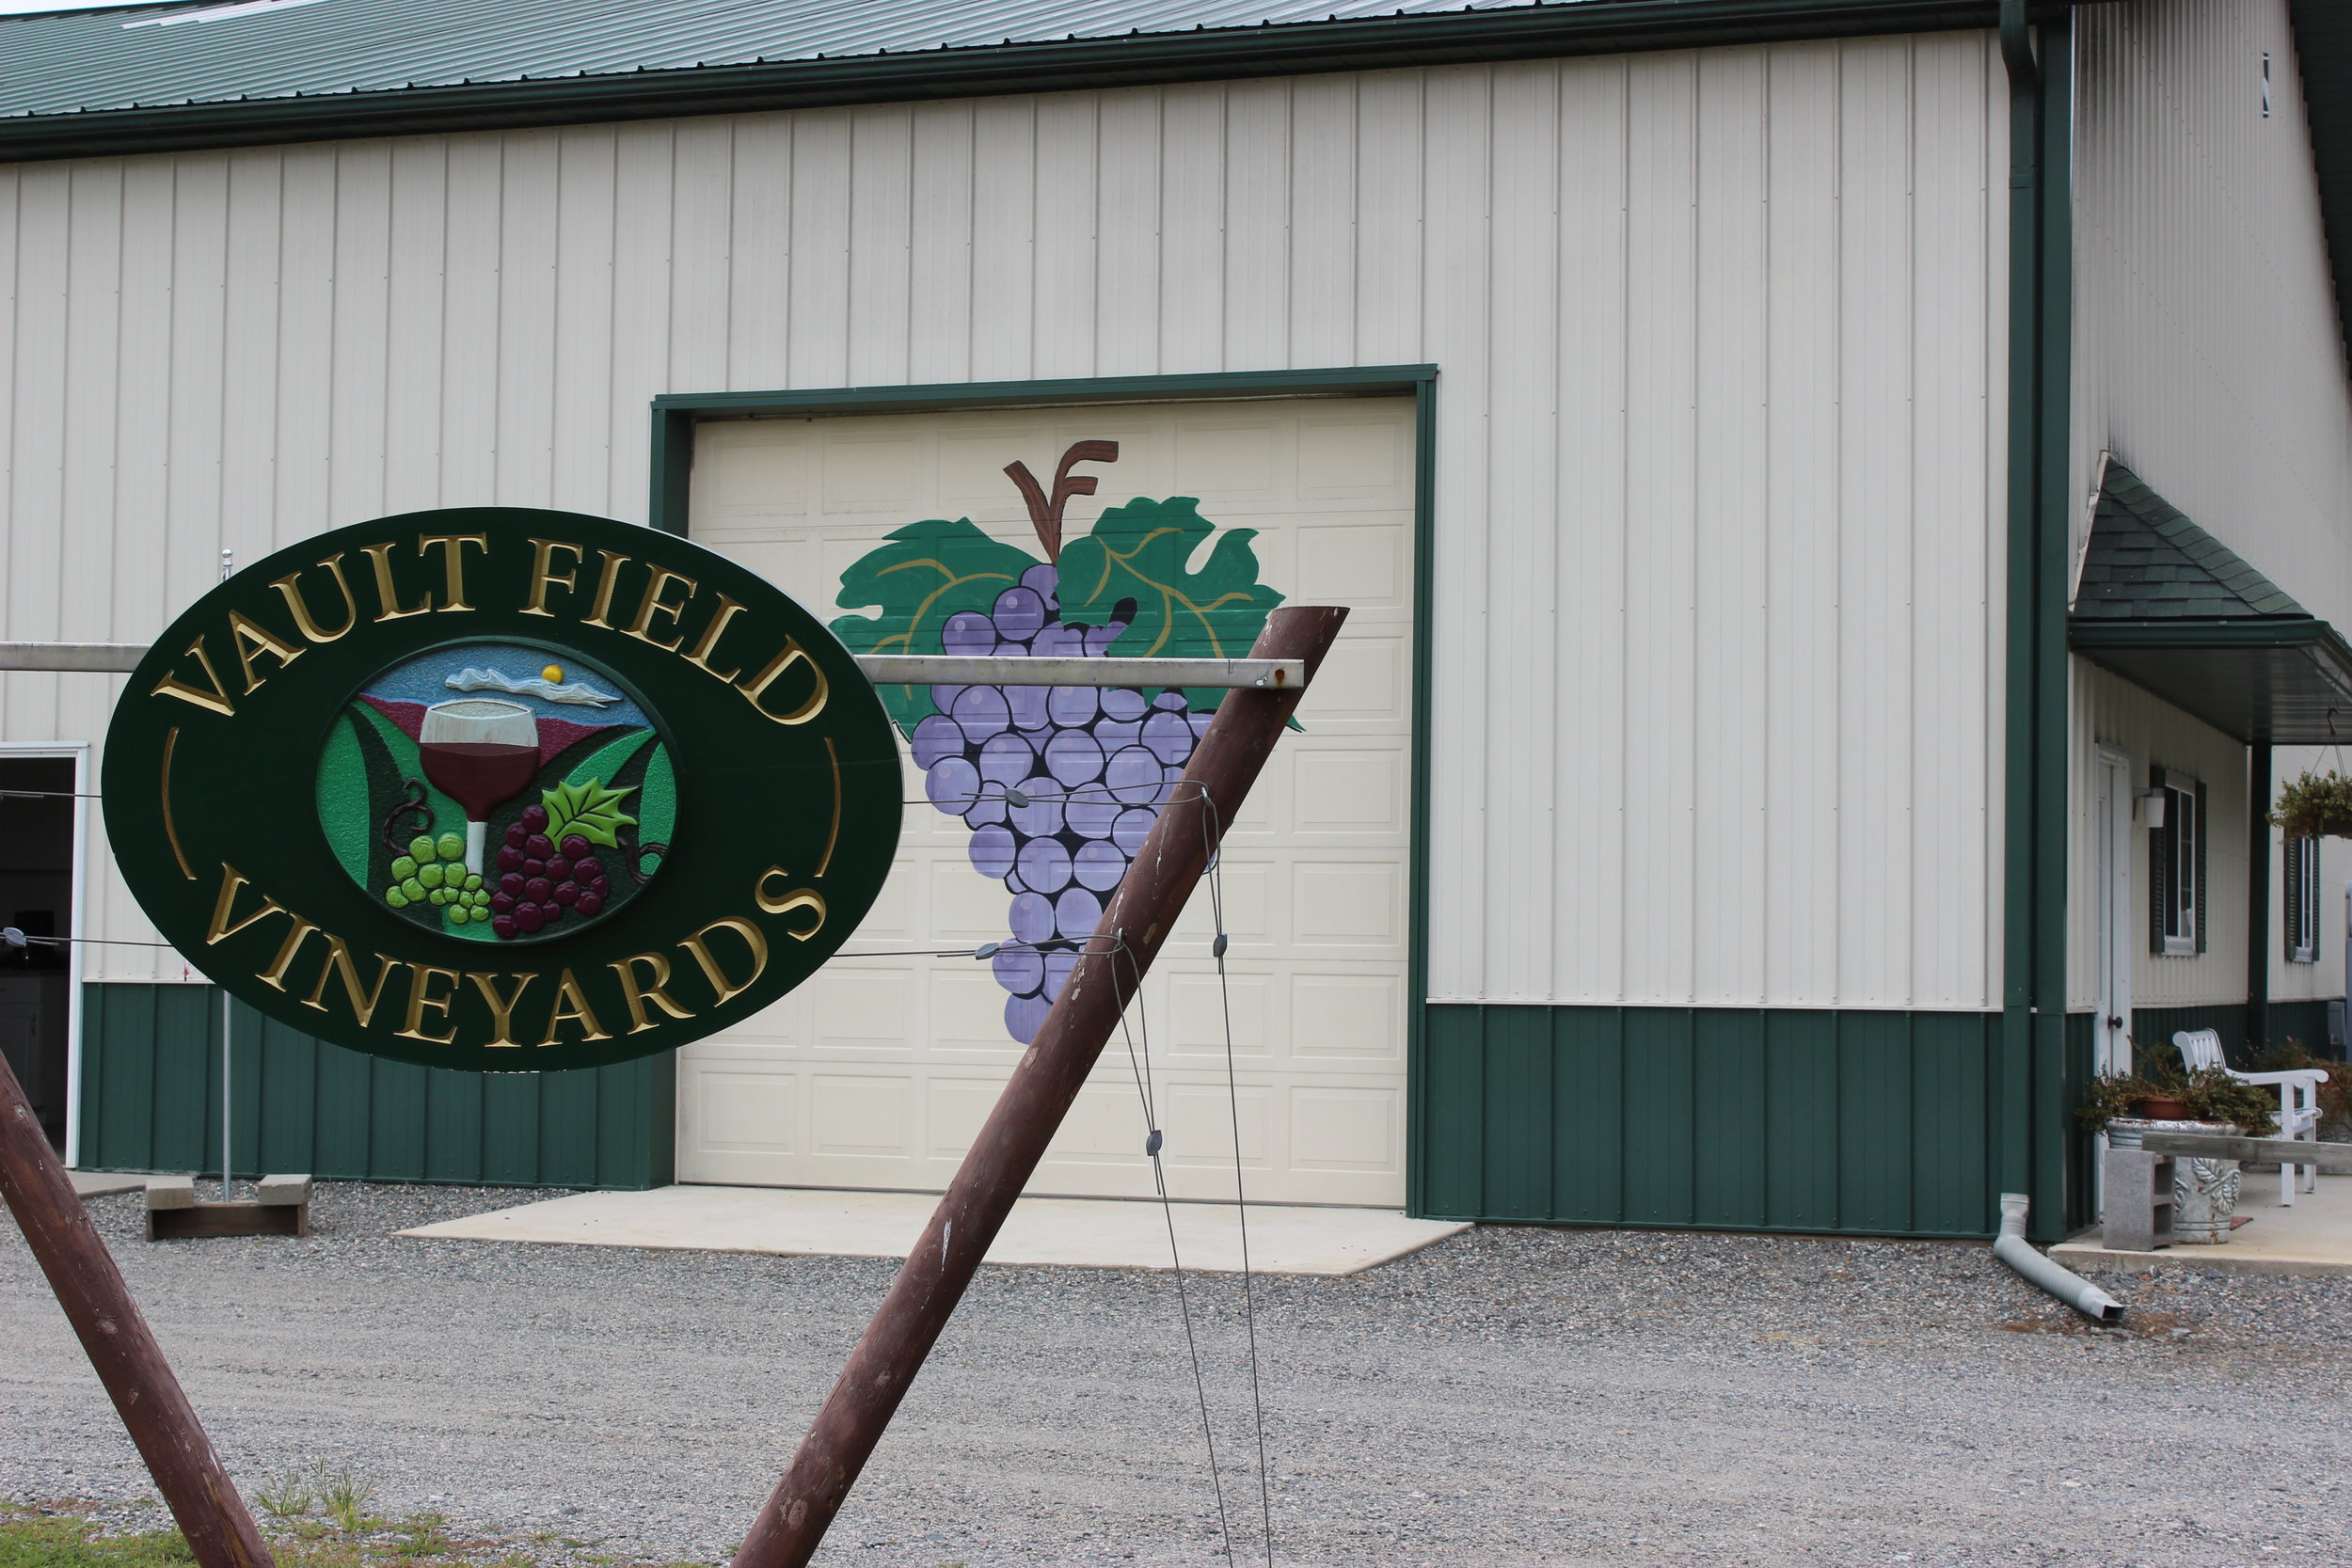 Vault Field Vineyards